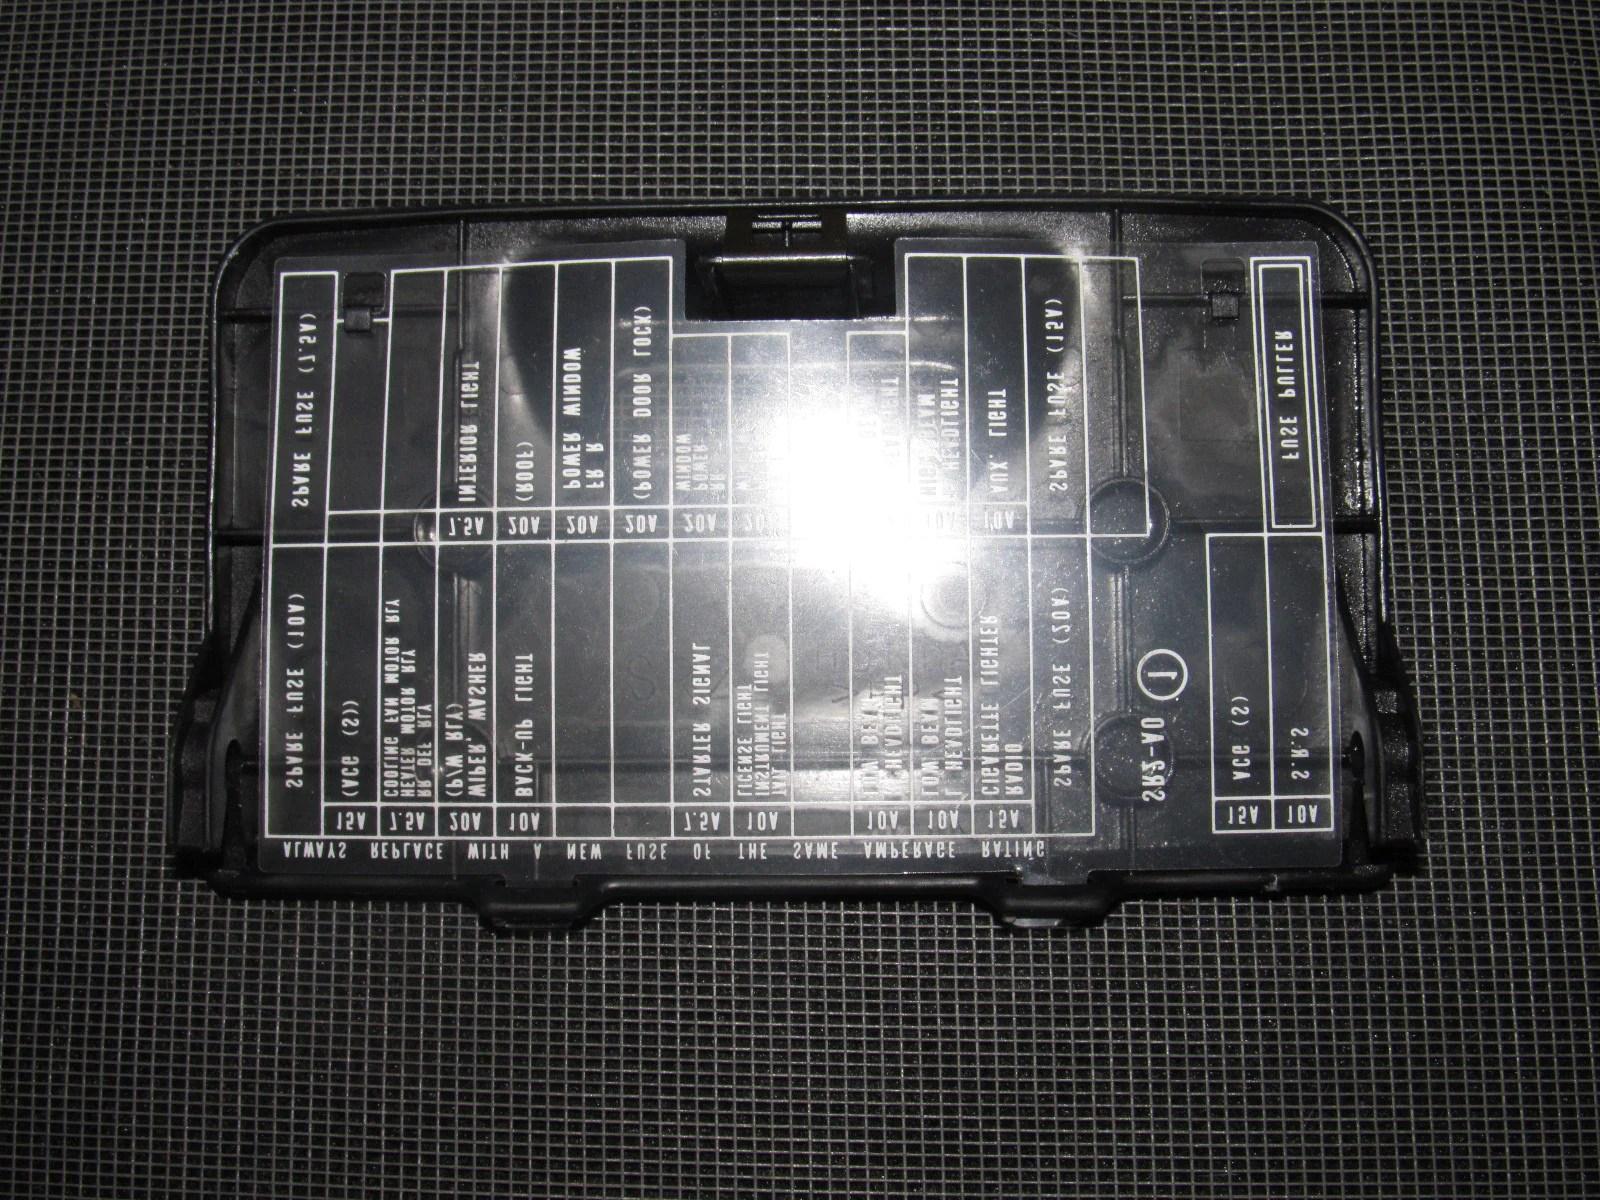 93 94 95 96 97 Honda Del Sol OEM Interior Fuse Box Cover